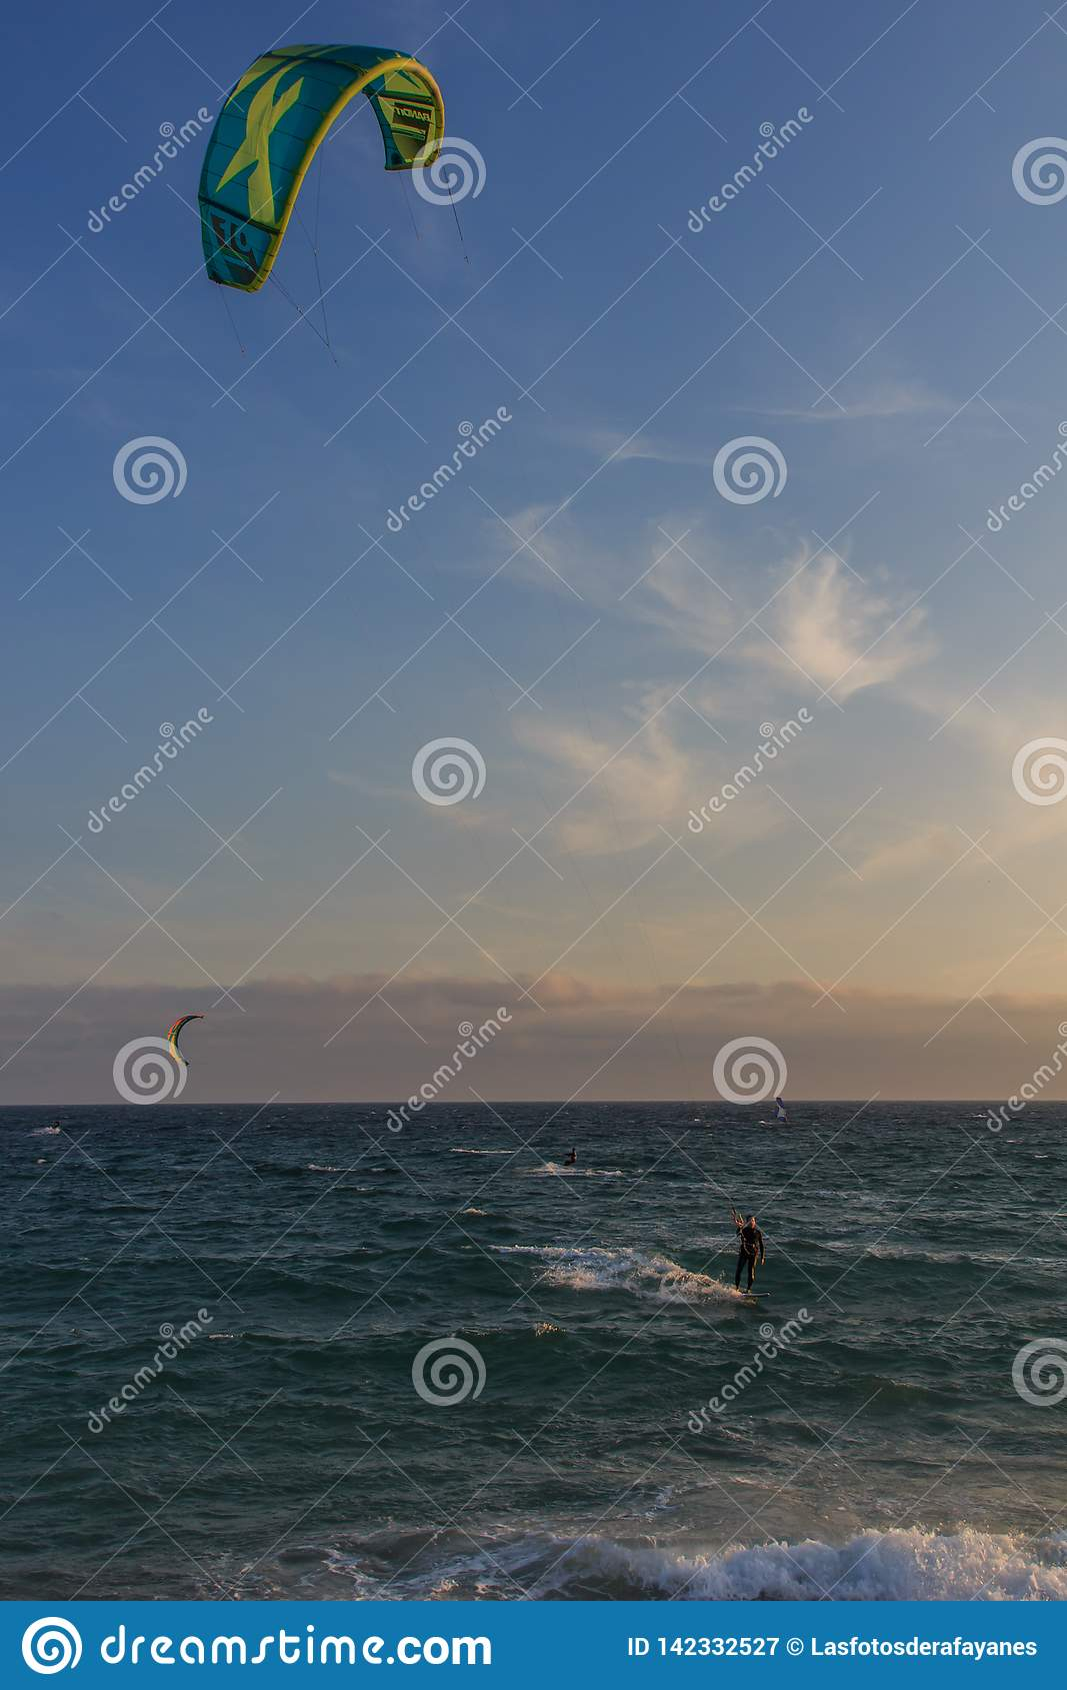 Cabrera de Mar,Barcelona/Spain; 02 08 2019: A good afternoon to practice Windsurfing and Kitesurfing Flysurf at Cabrera beach at